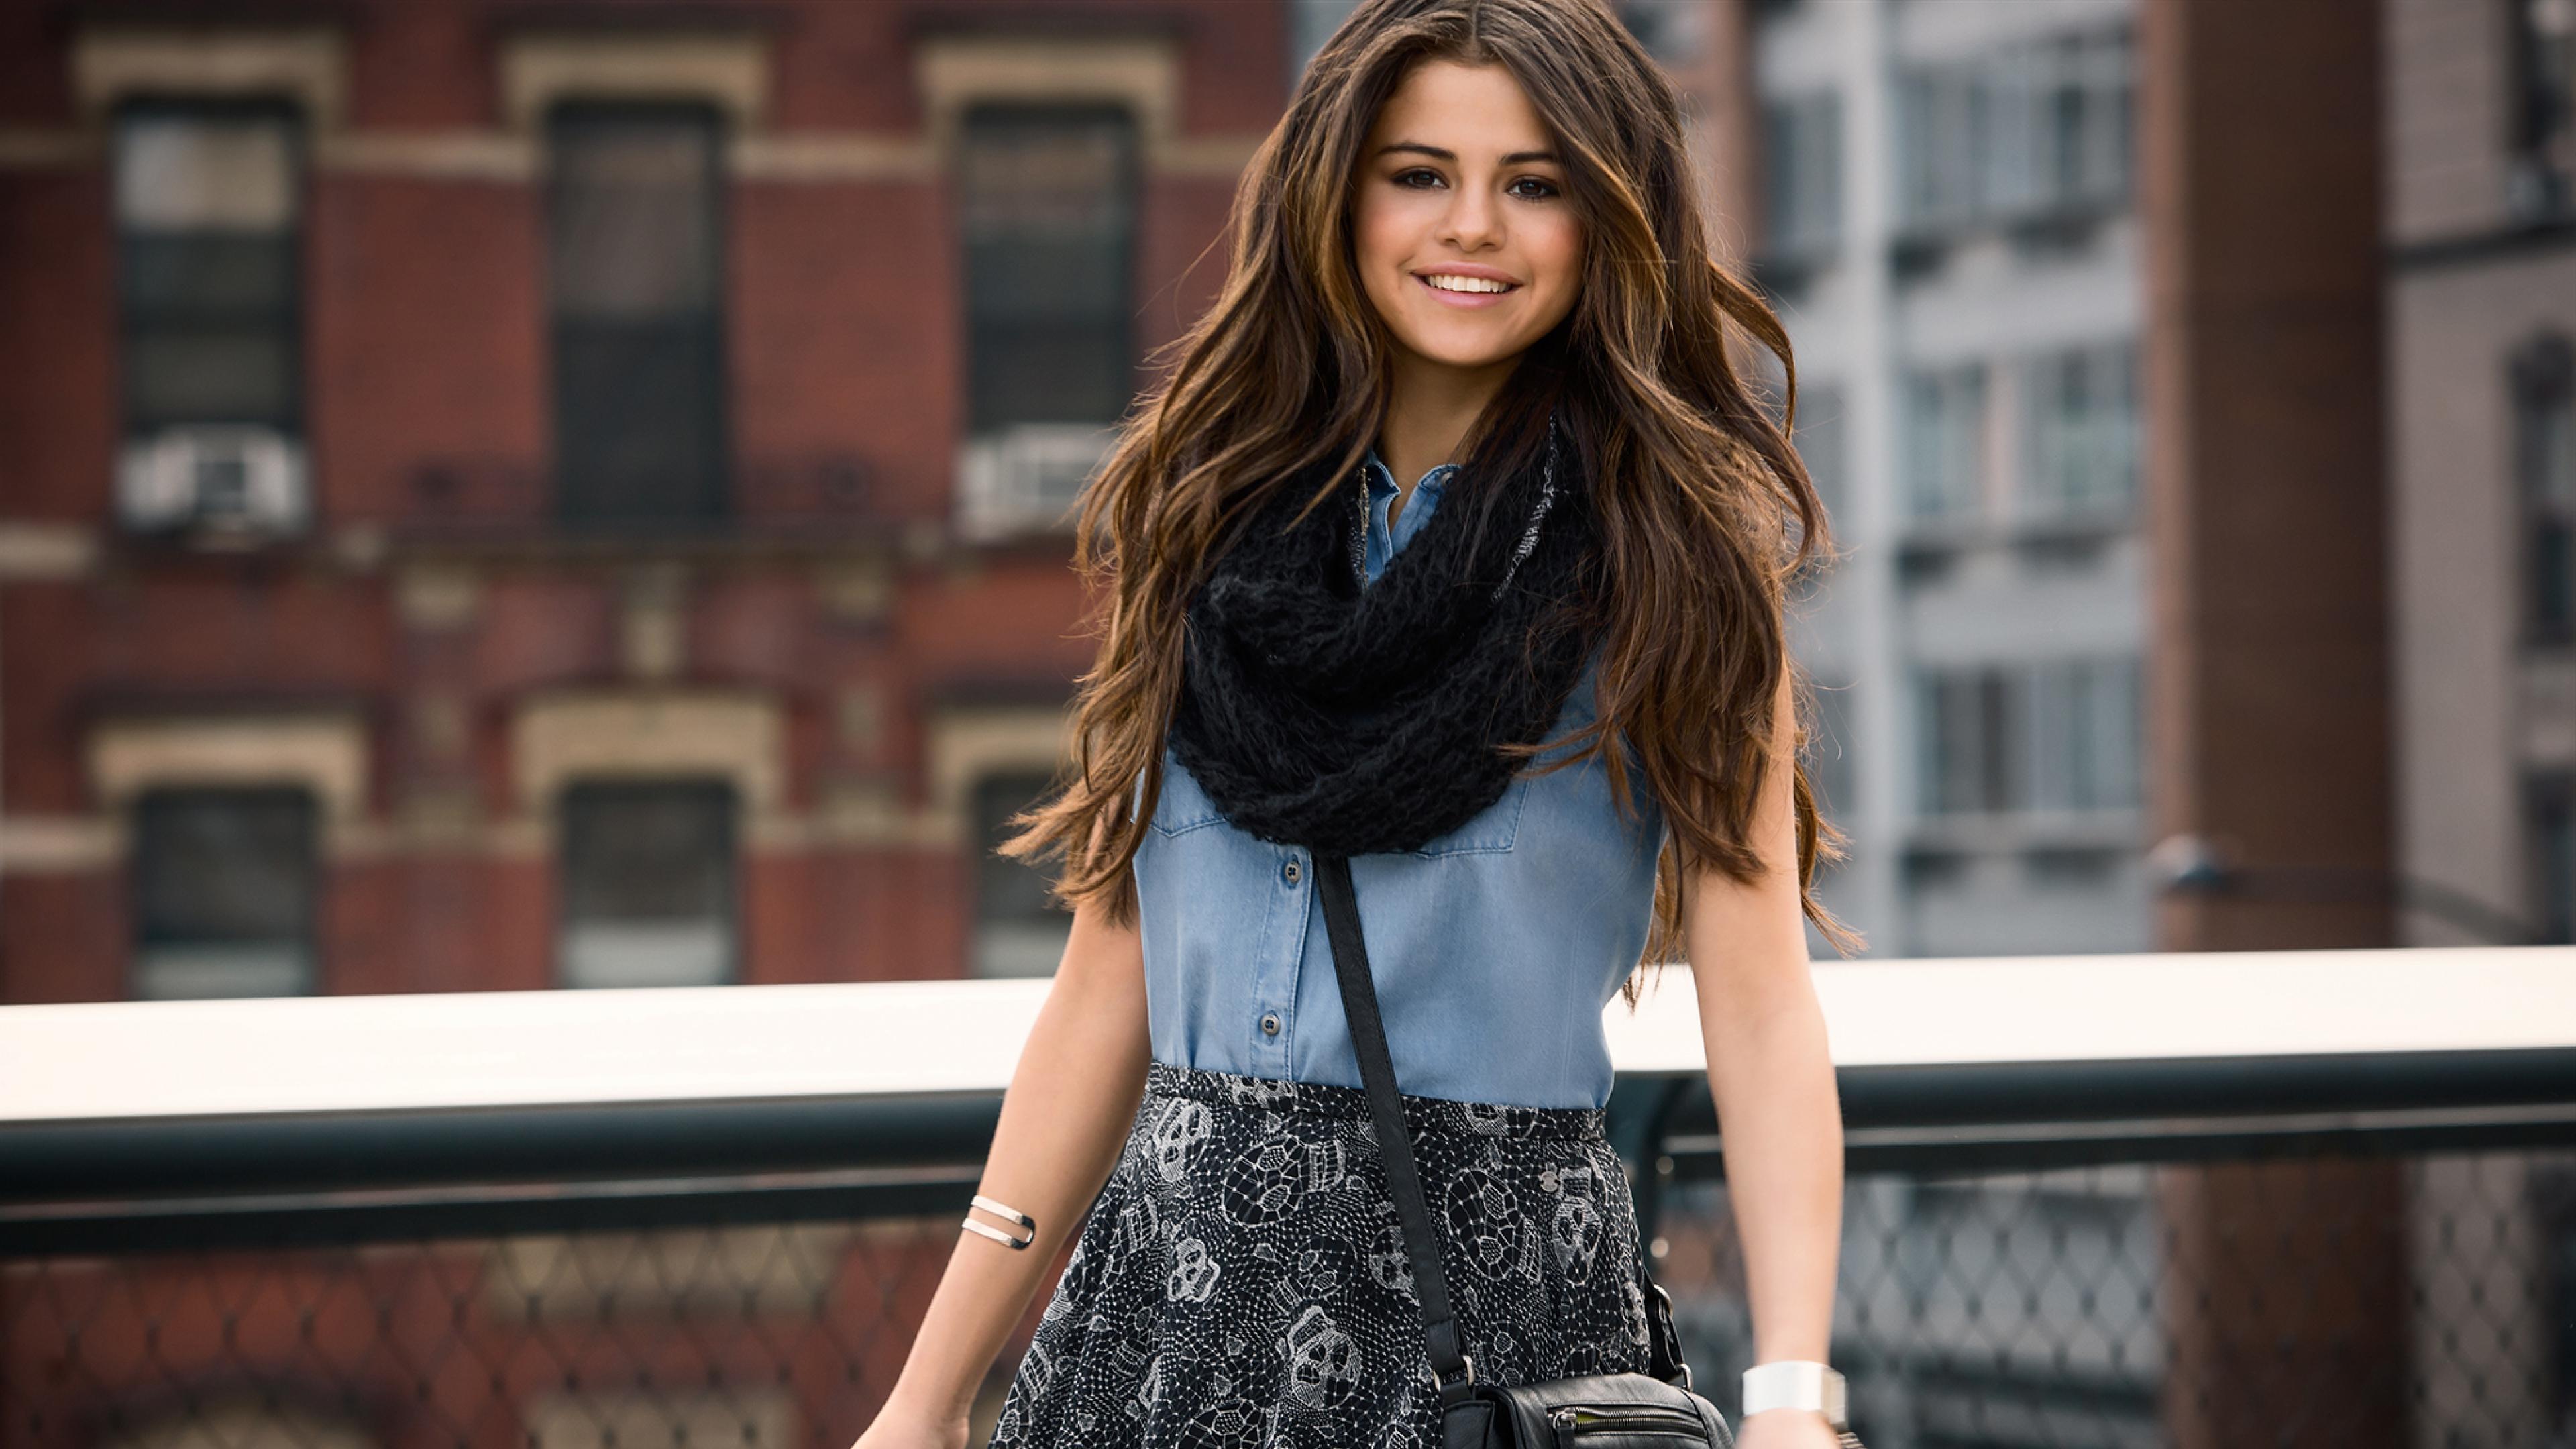 selena gomez 3 1536855405 - Selena Gomez 3 - selena gomez wallpapers, photoshoot wallpapers, celebrities wallpapers